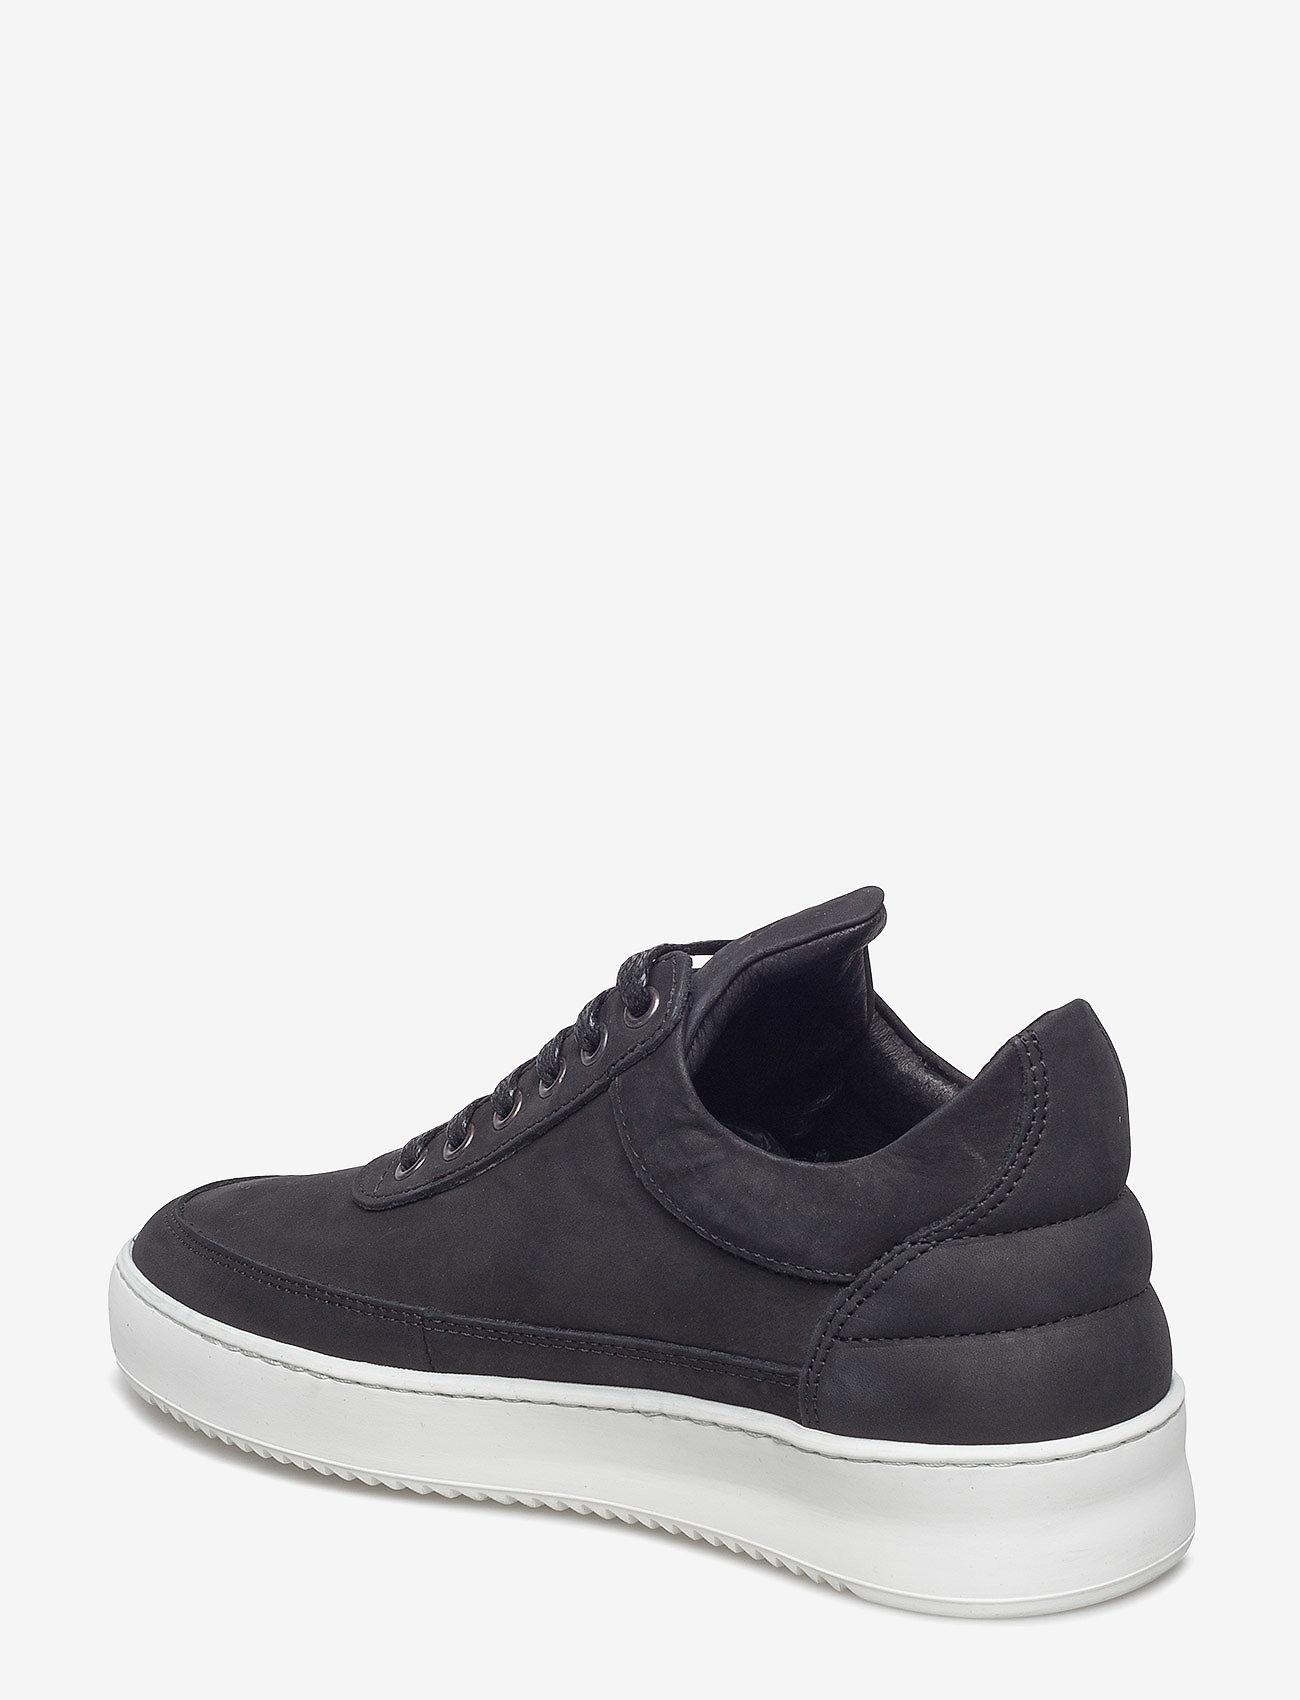 Filling Pieces - Low Top Ripple Basic Black / White - låga sneakers - black/white - 2